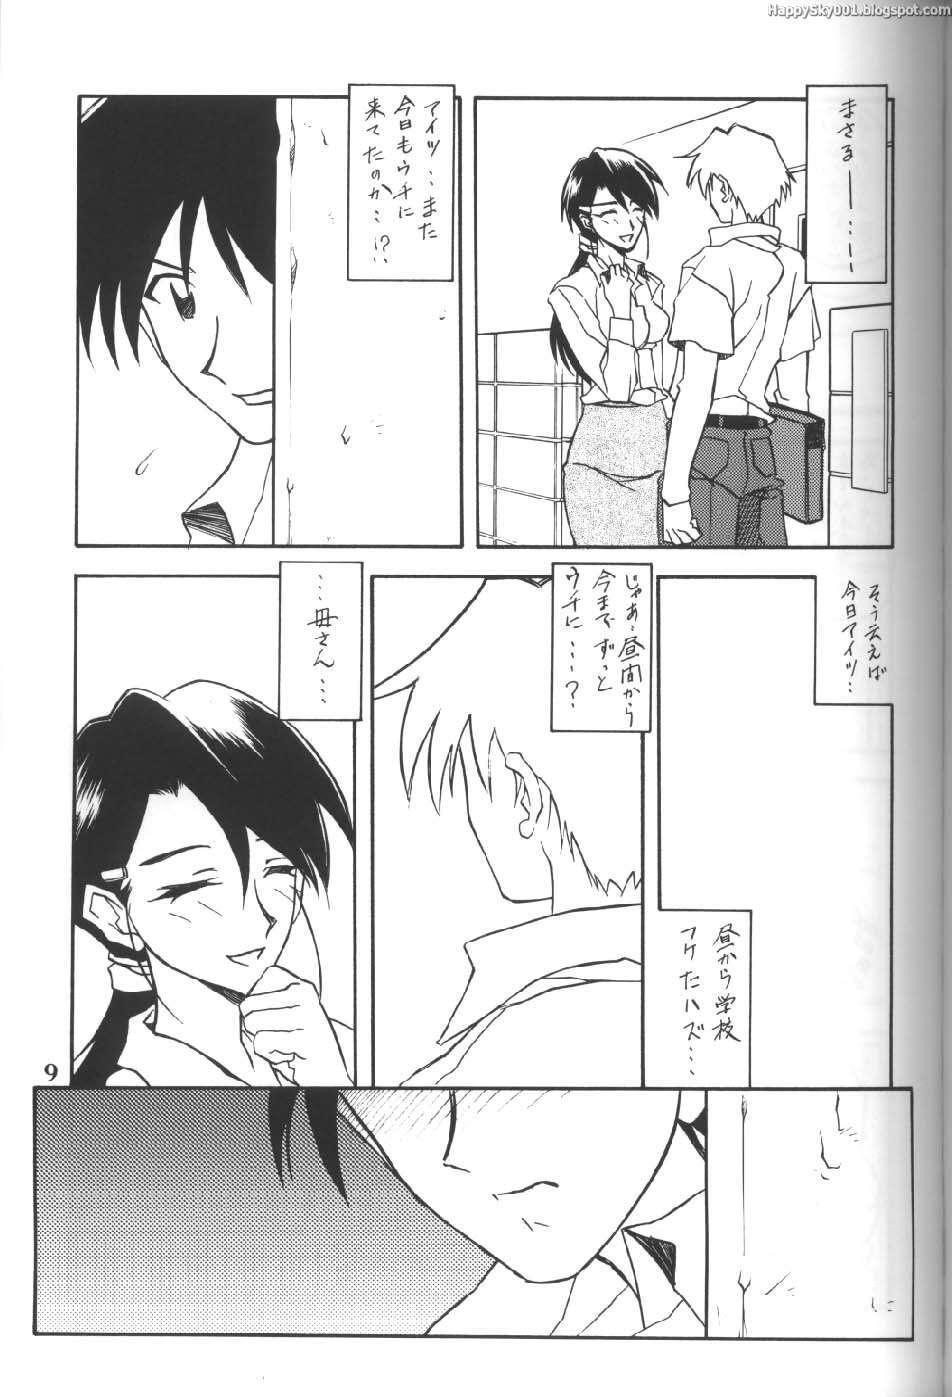 Yama Hime no Mi 7